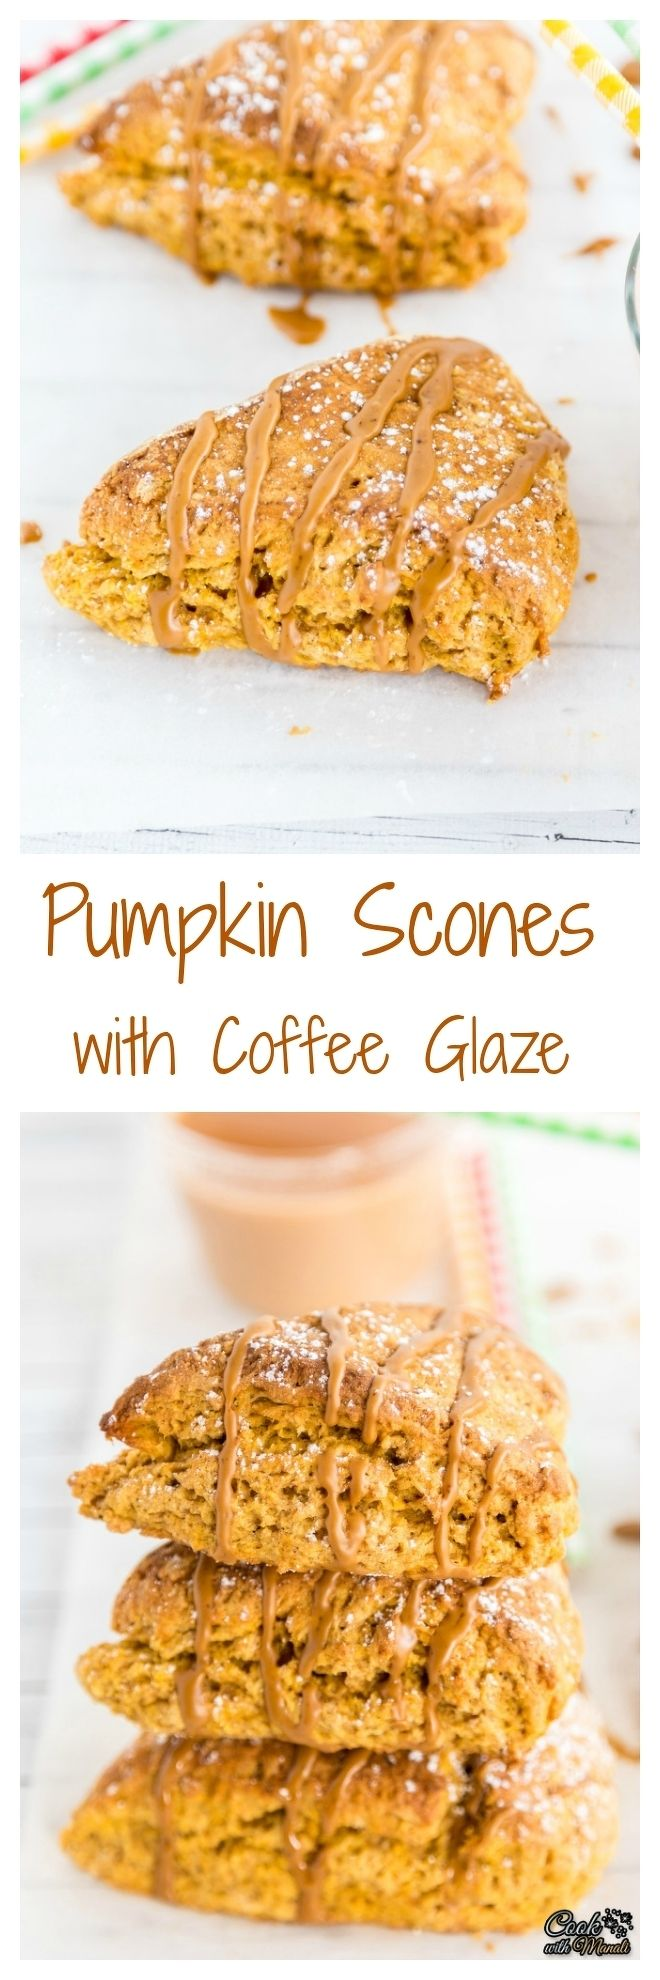 Pumpkin Scones with Coffee Glaze Collage-nocwm